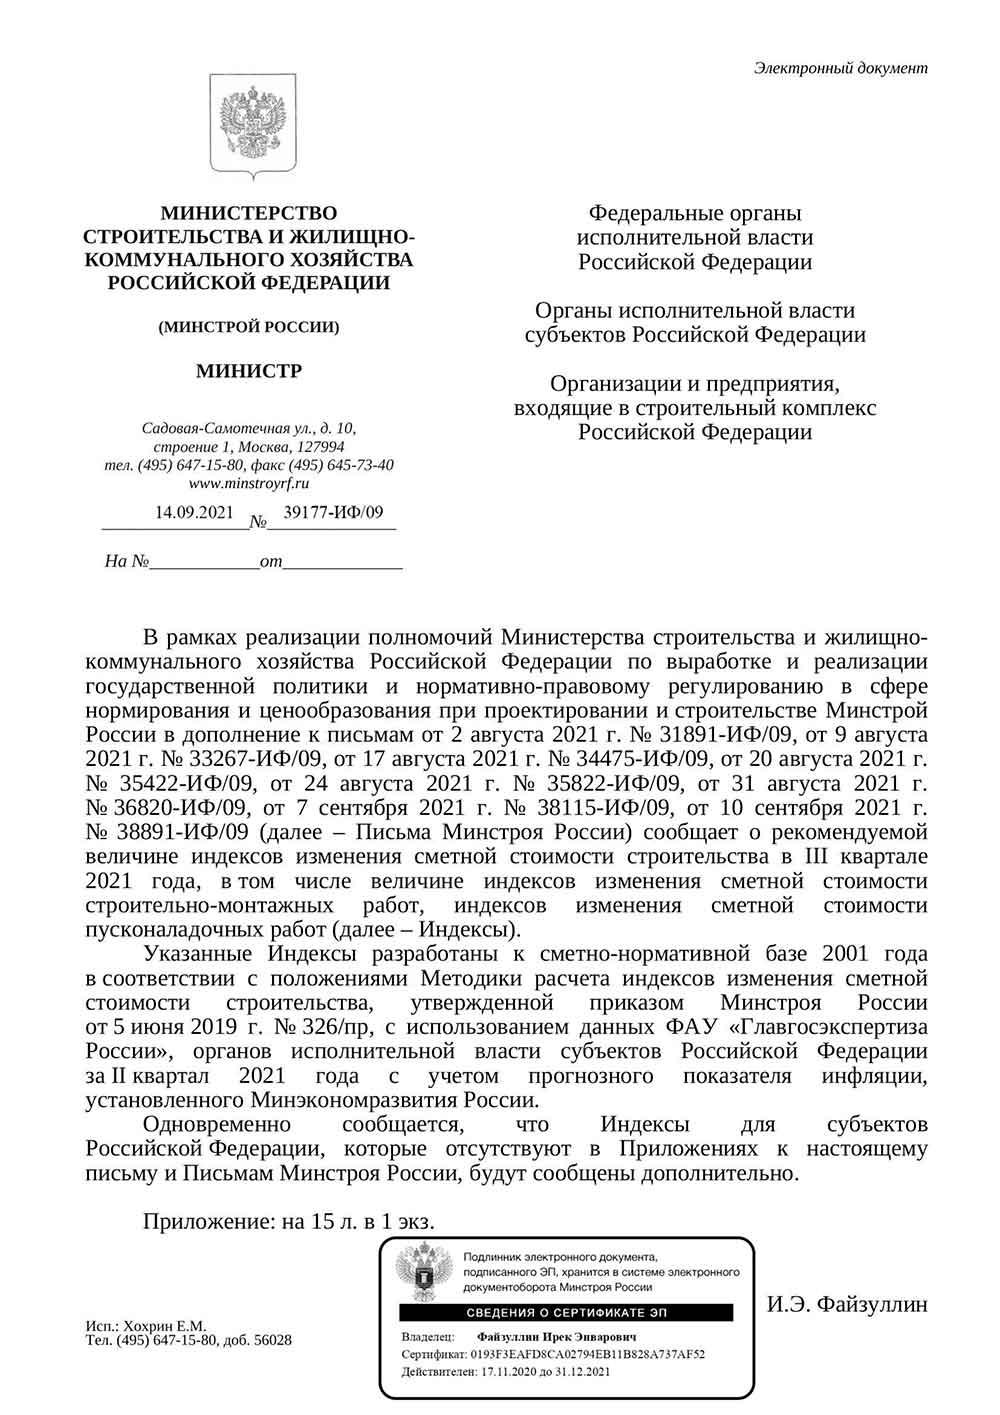 Письмо Минстроя РФ №39327-ИФ/09 от 14.09.2021 г.